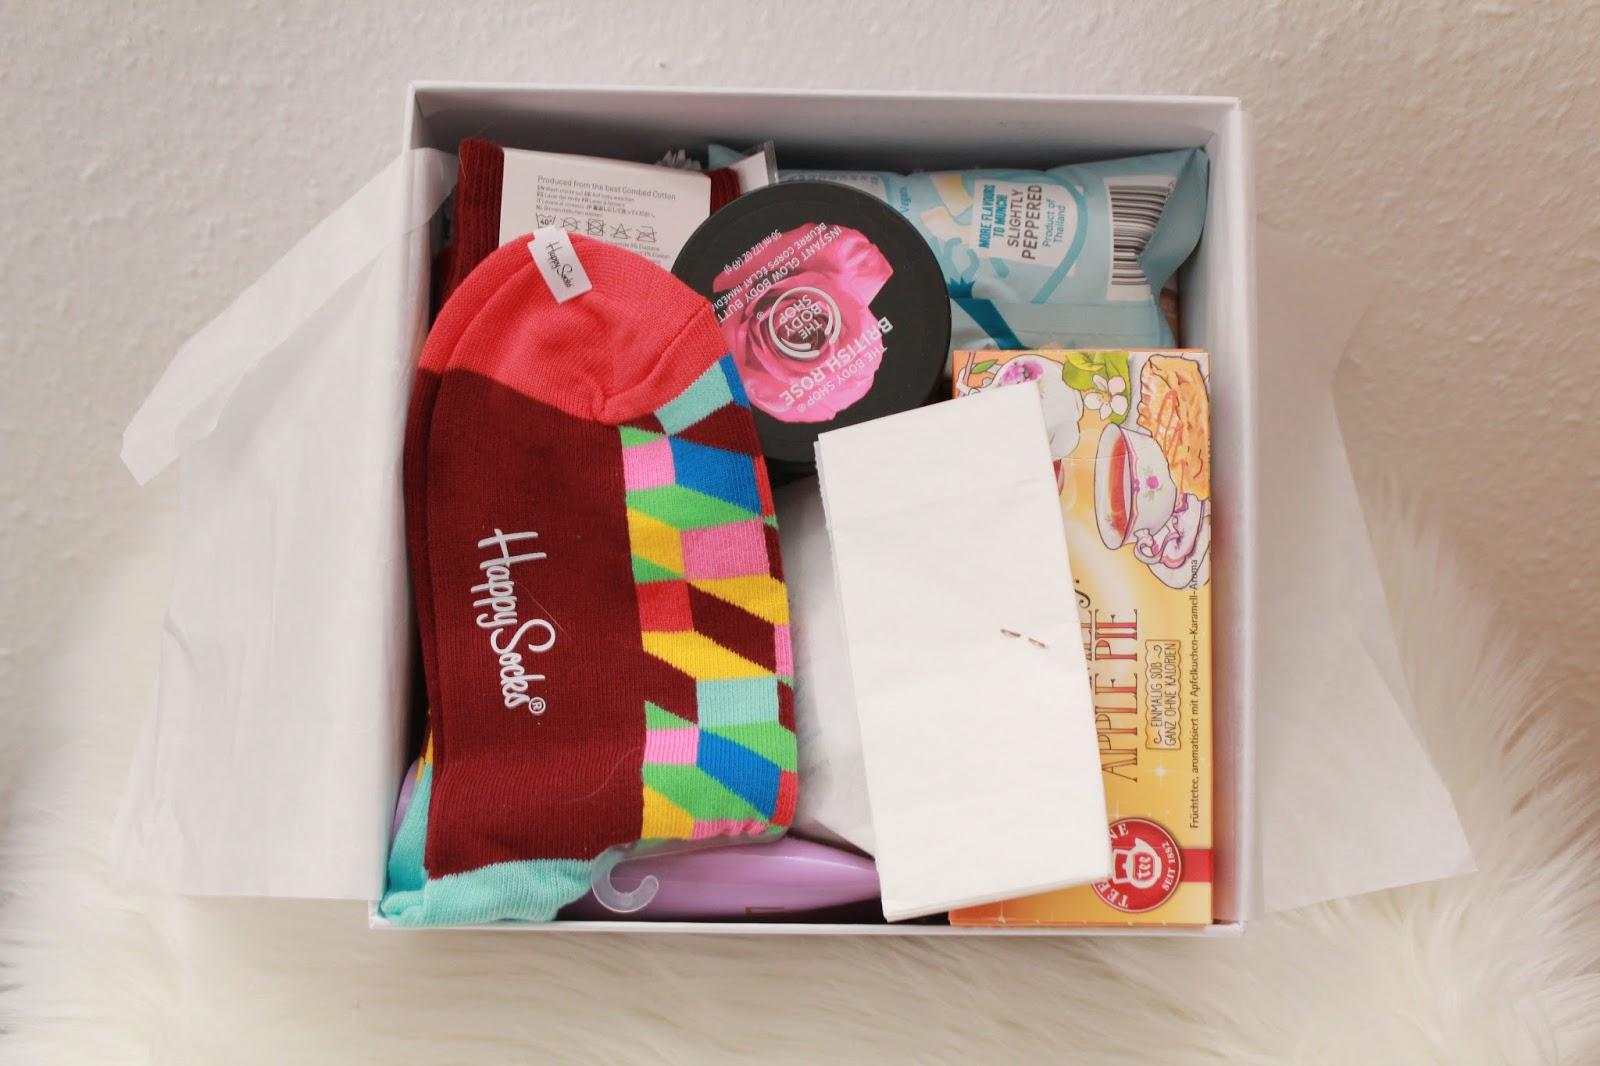 Himbeertraum instyle box m rz 2016 for Boden rabatt